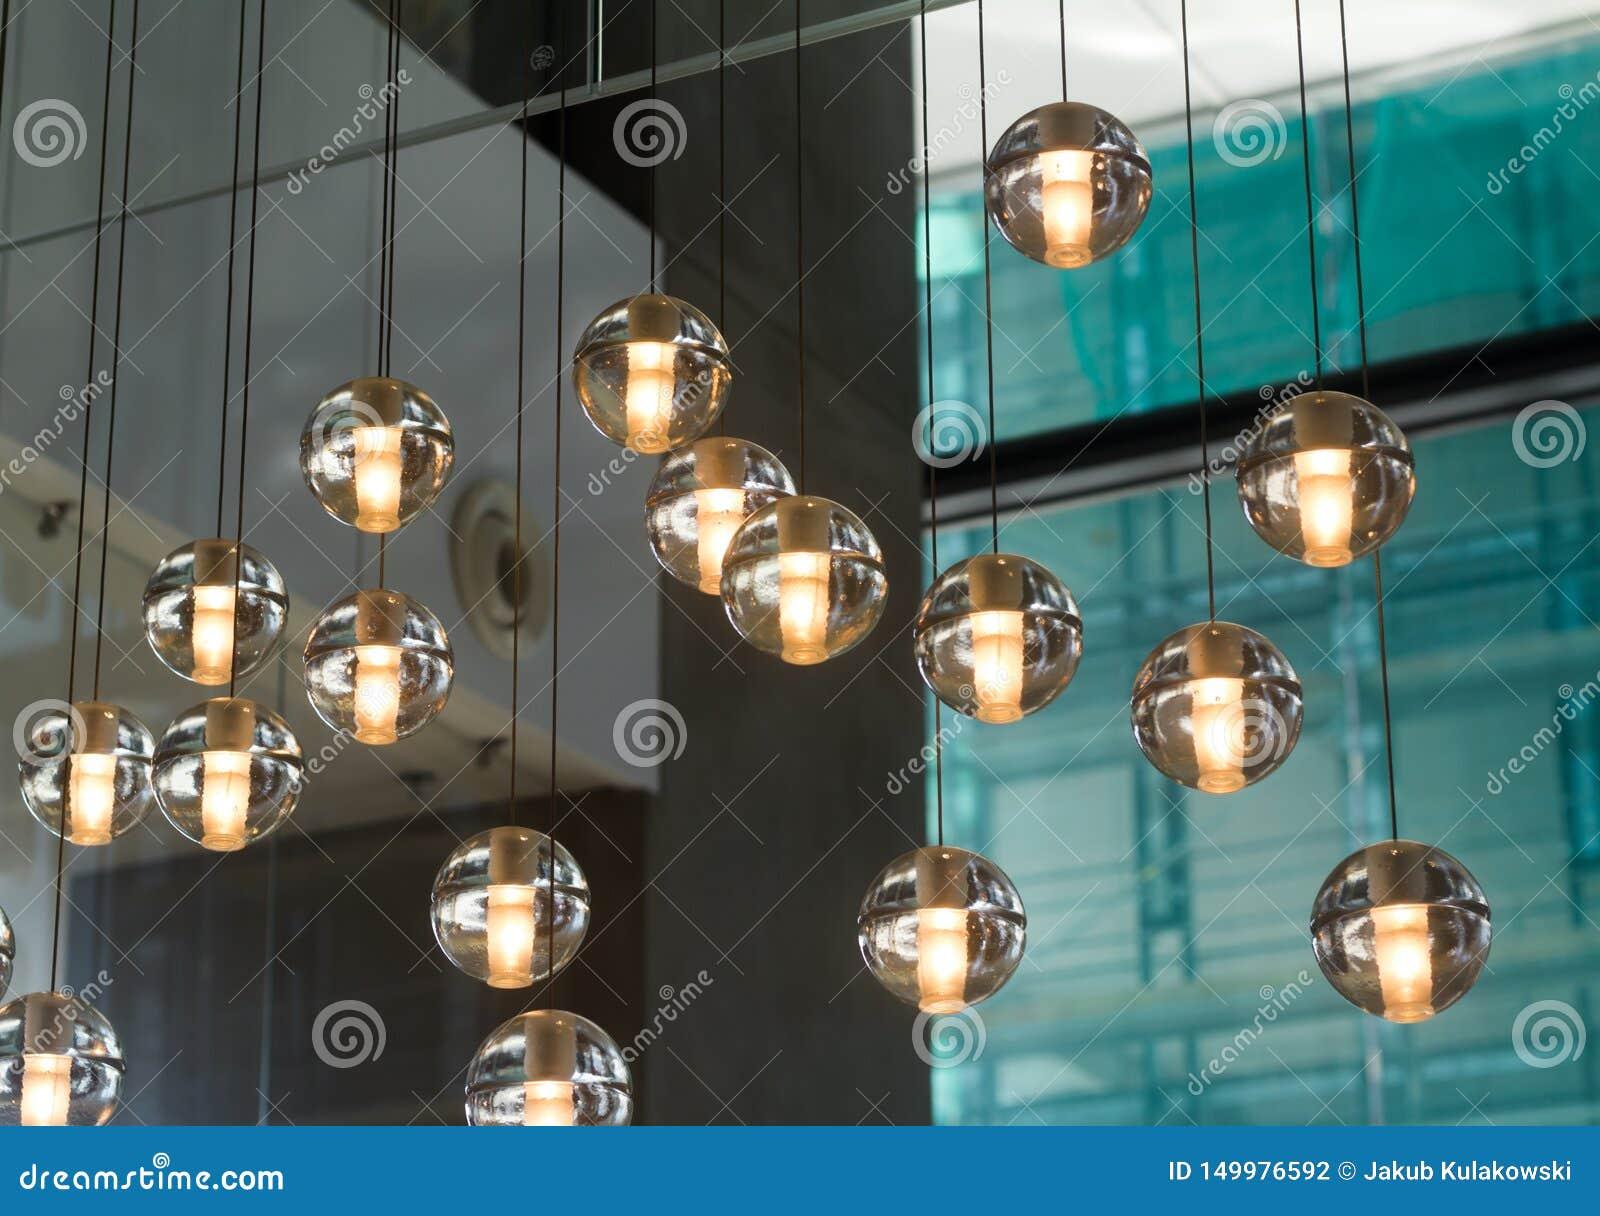 Small round designer glass lamps